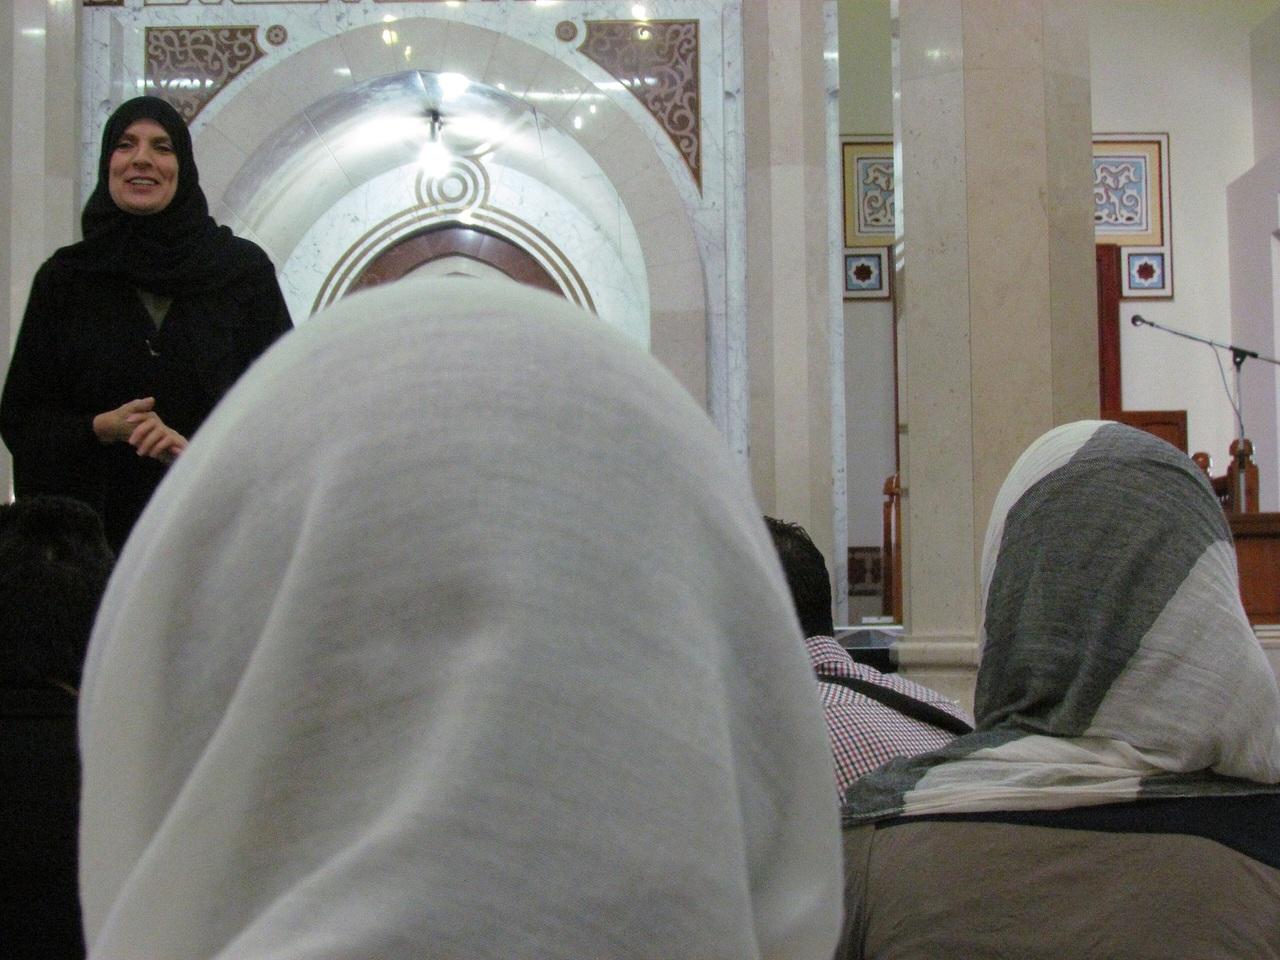 Pray like a muslim. Aqui.